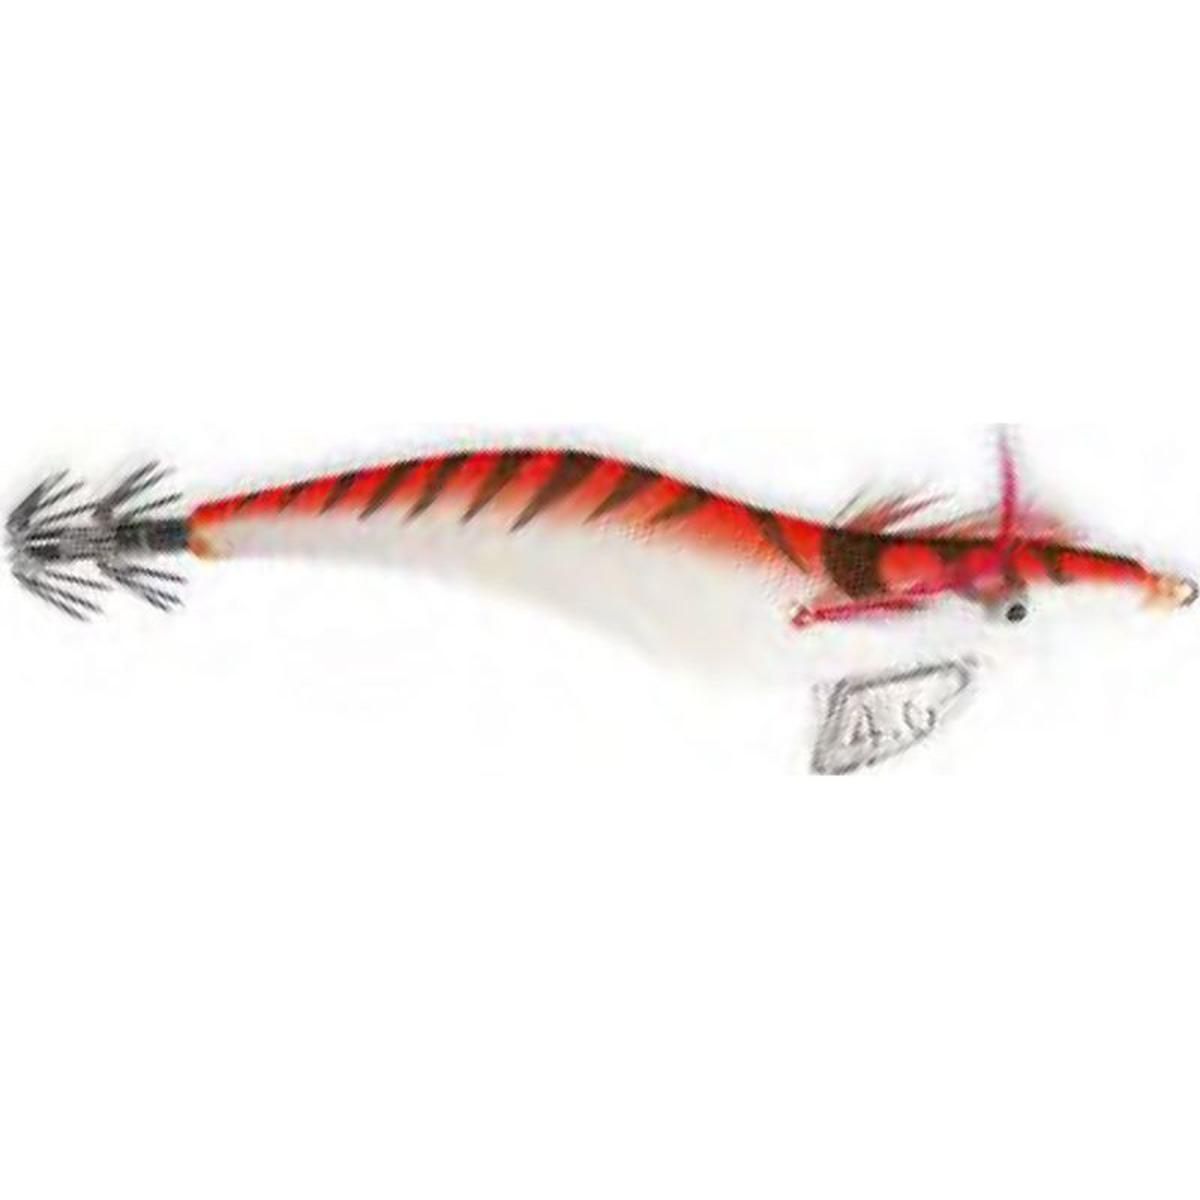 Lineaeffe Totanare Seta - Red - Tamaño 2.5 - 7.5 cm